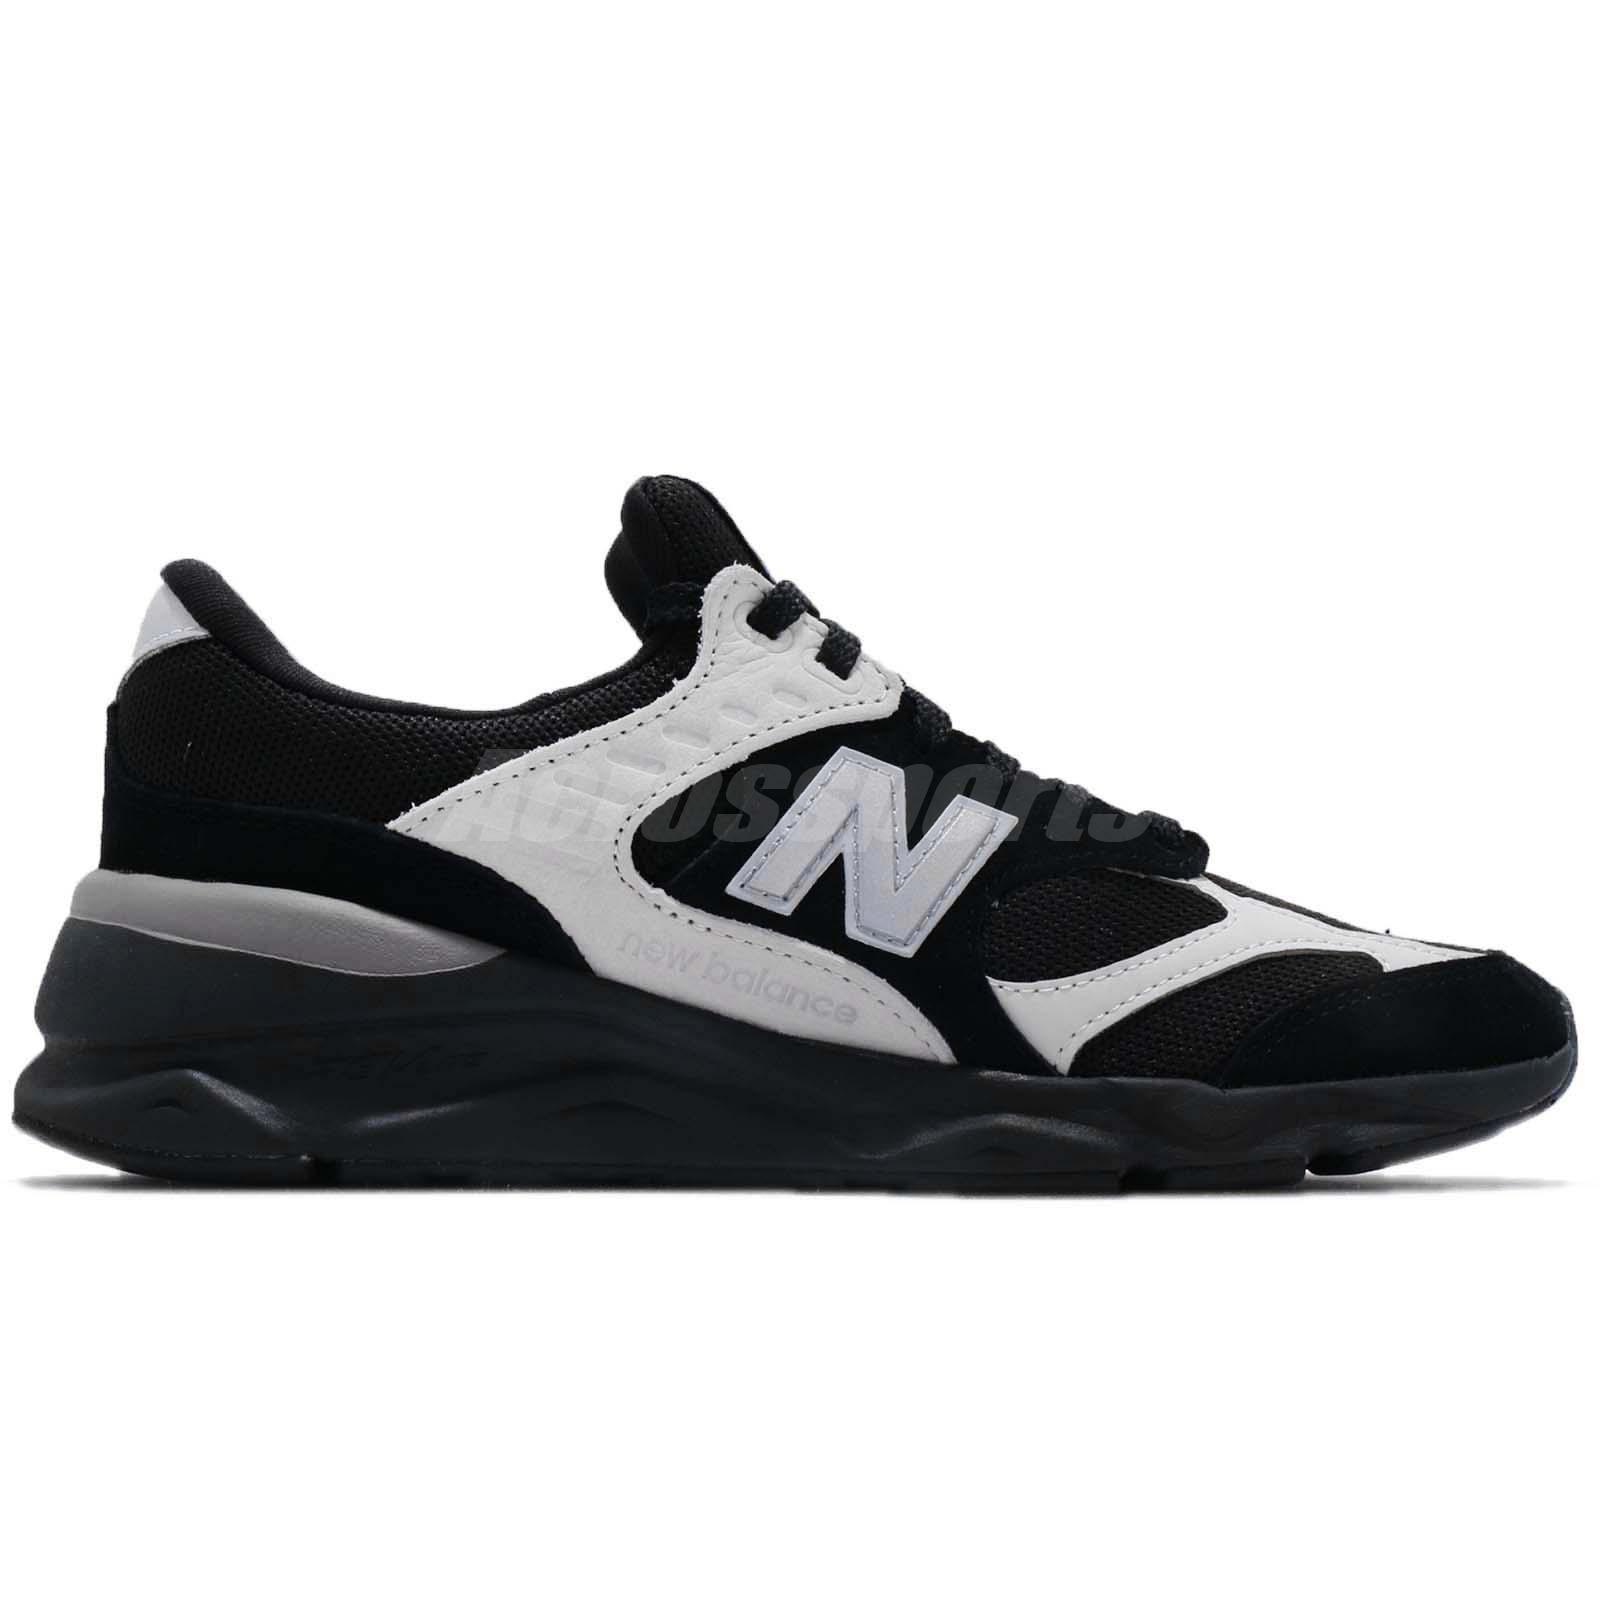 New Balance MSX90SID D Black Grey Blue Men Running Shoes Sneakers ... 283e367584c